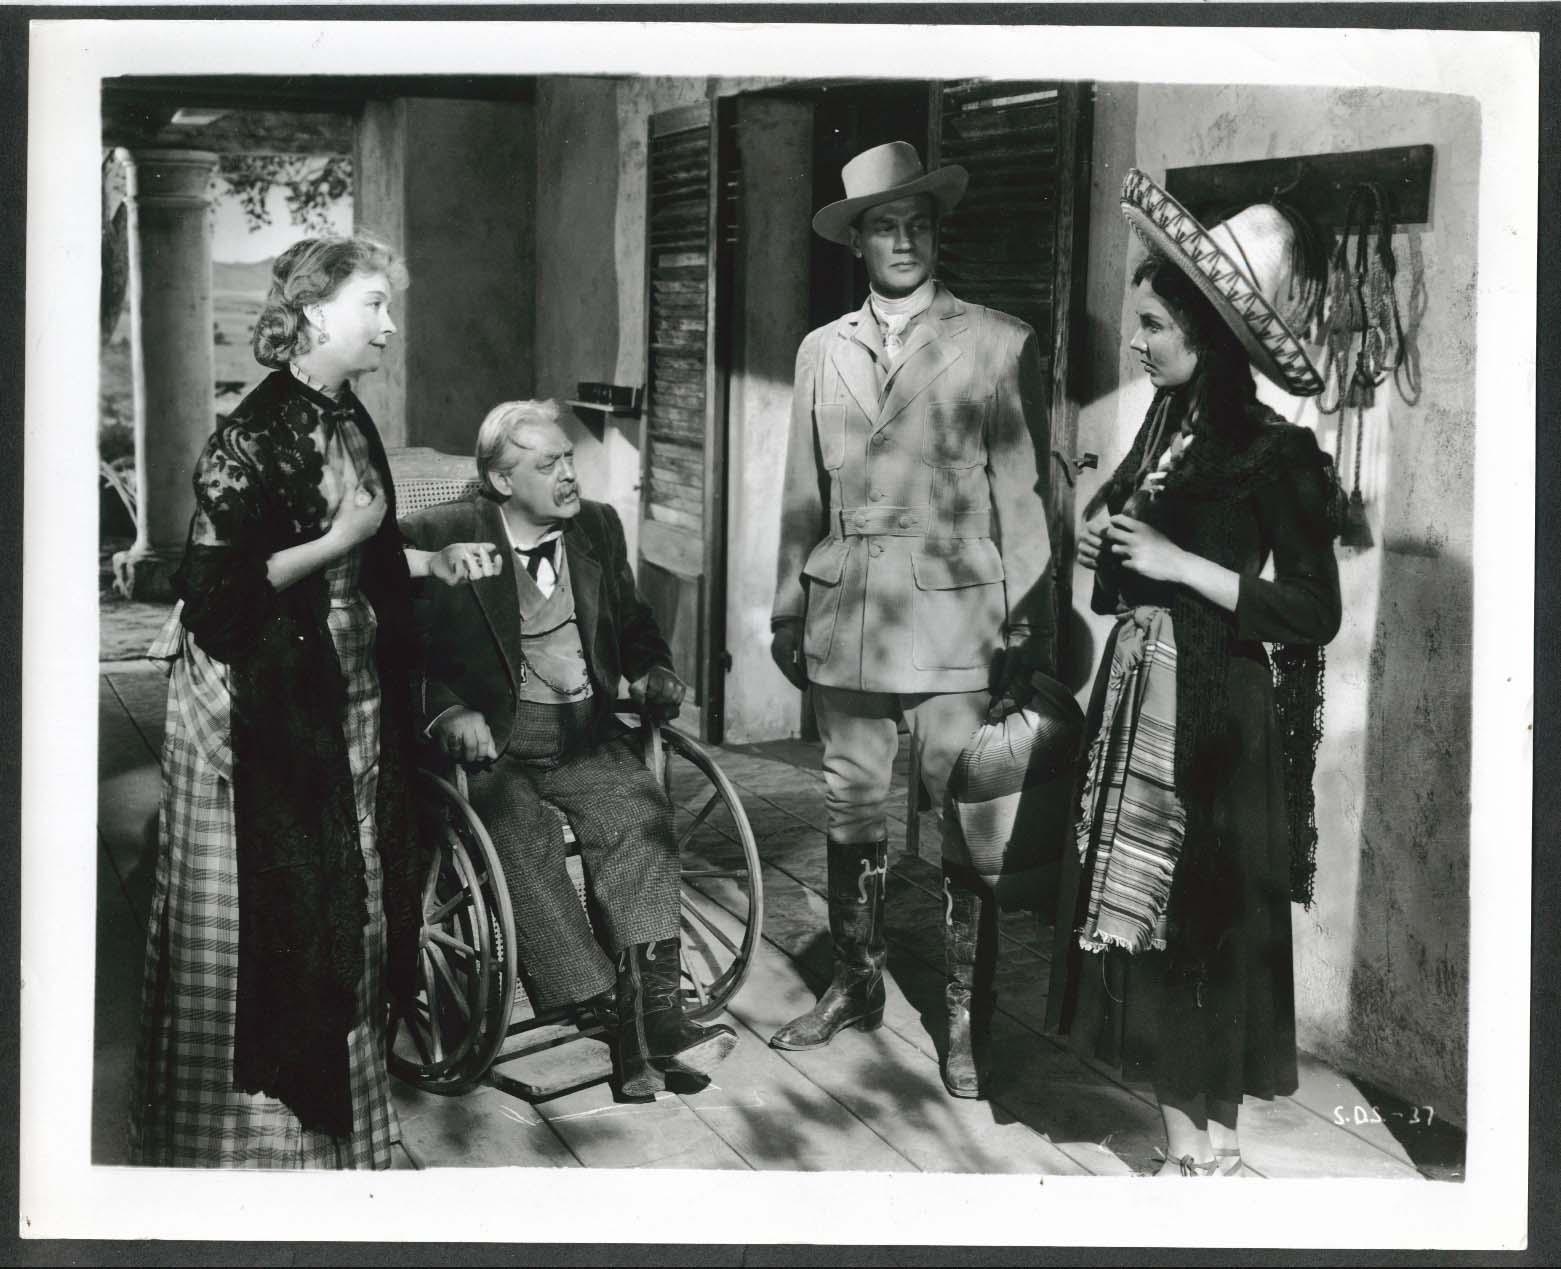 Image for Lillian Gish Lionel Barrymore Joseph Cotten Jennifer Jones Duel in Sun 8x10 1946